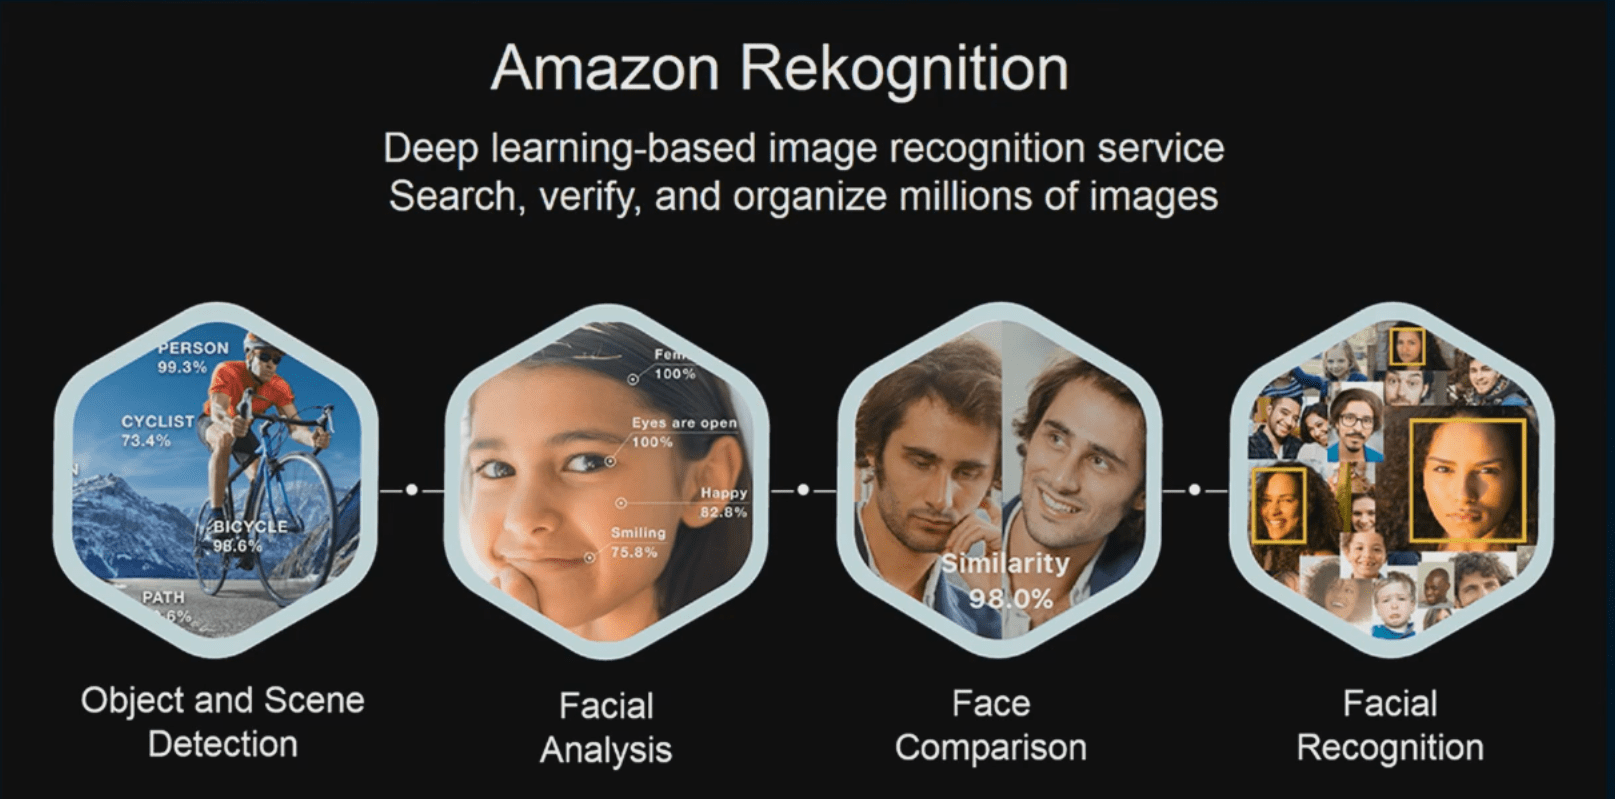 Amazon Rekognition Service